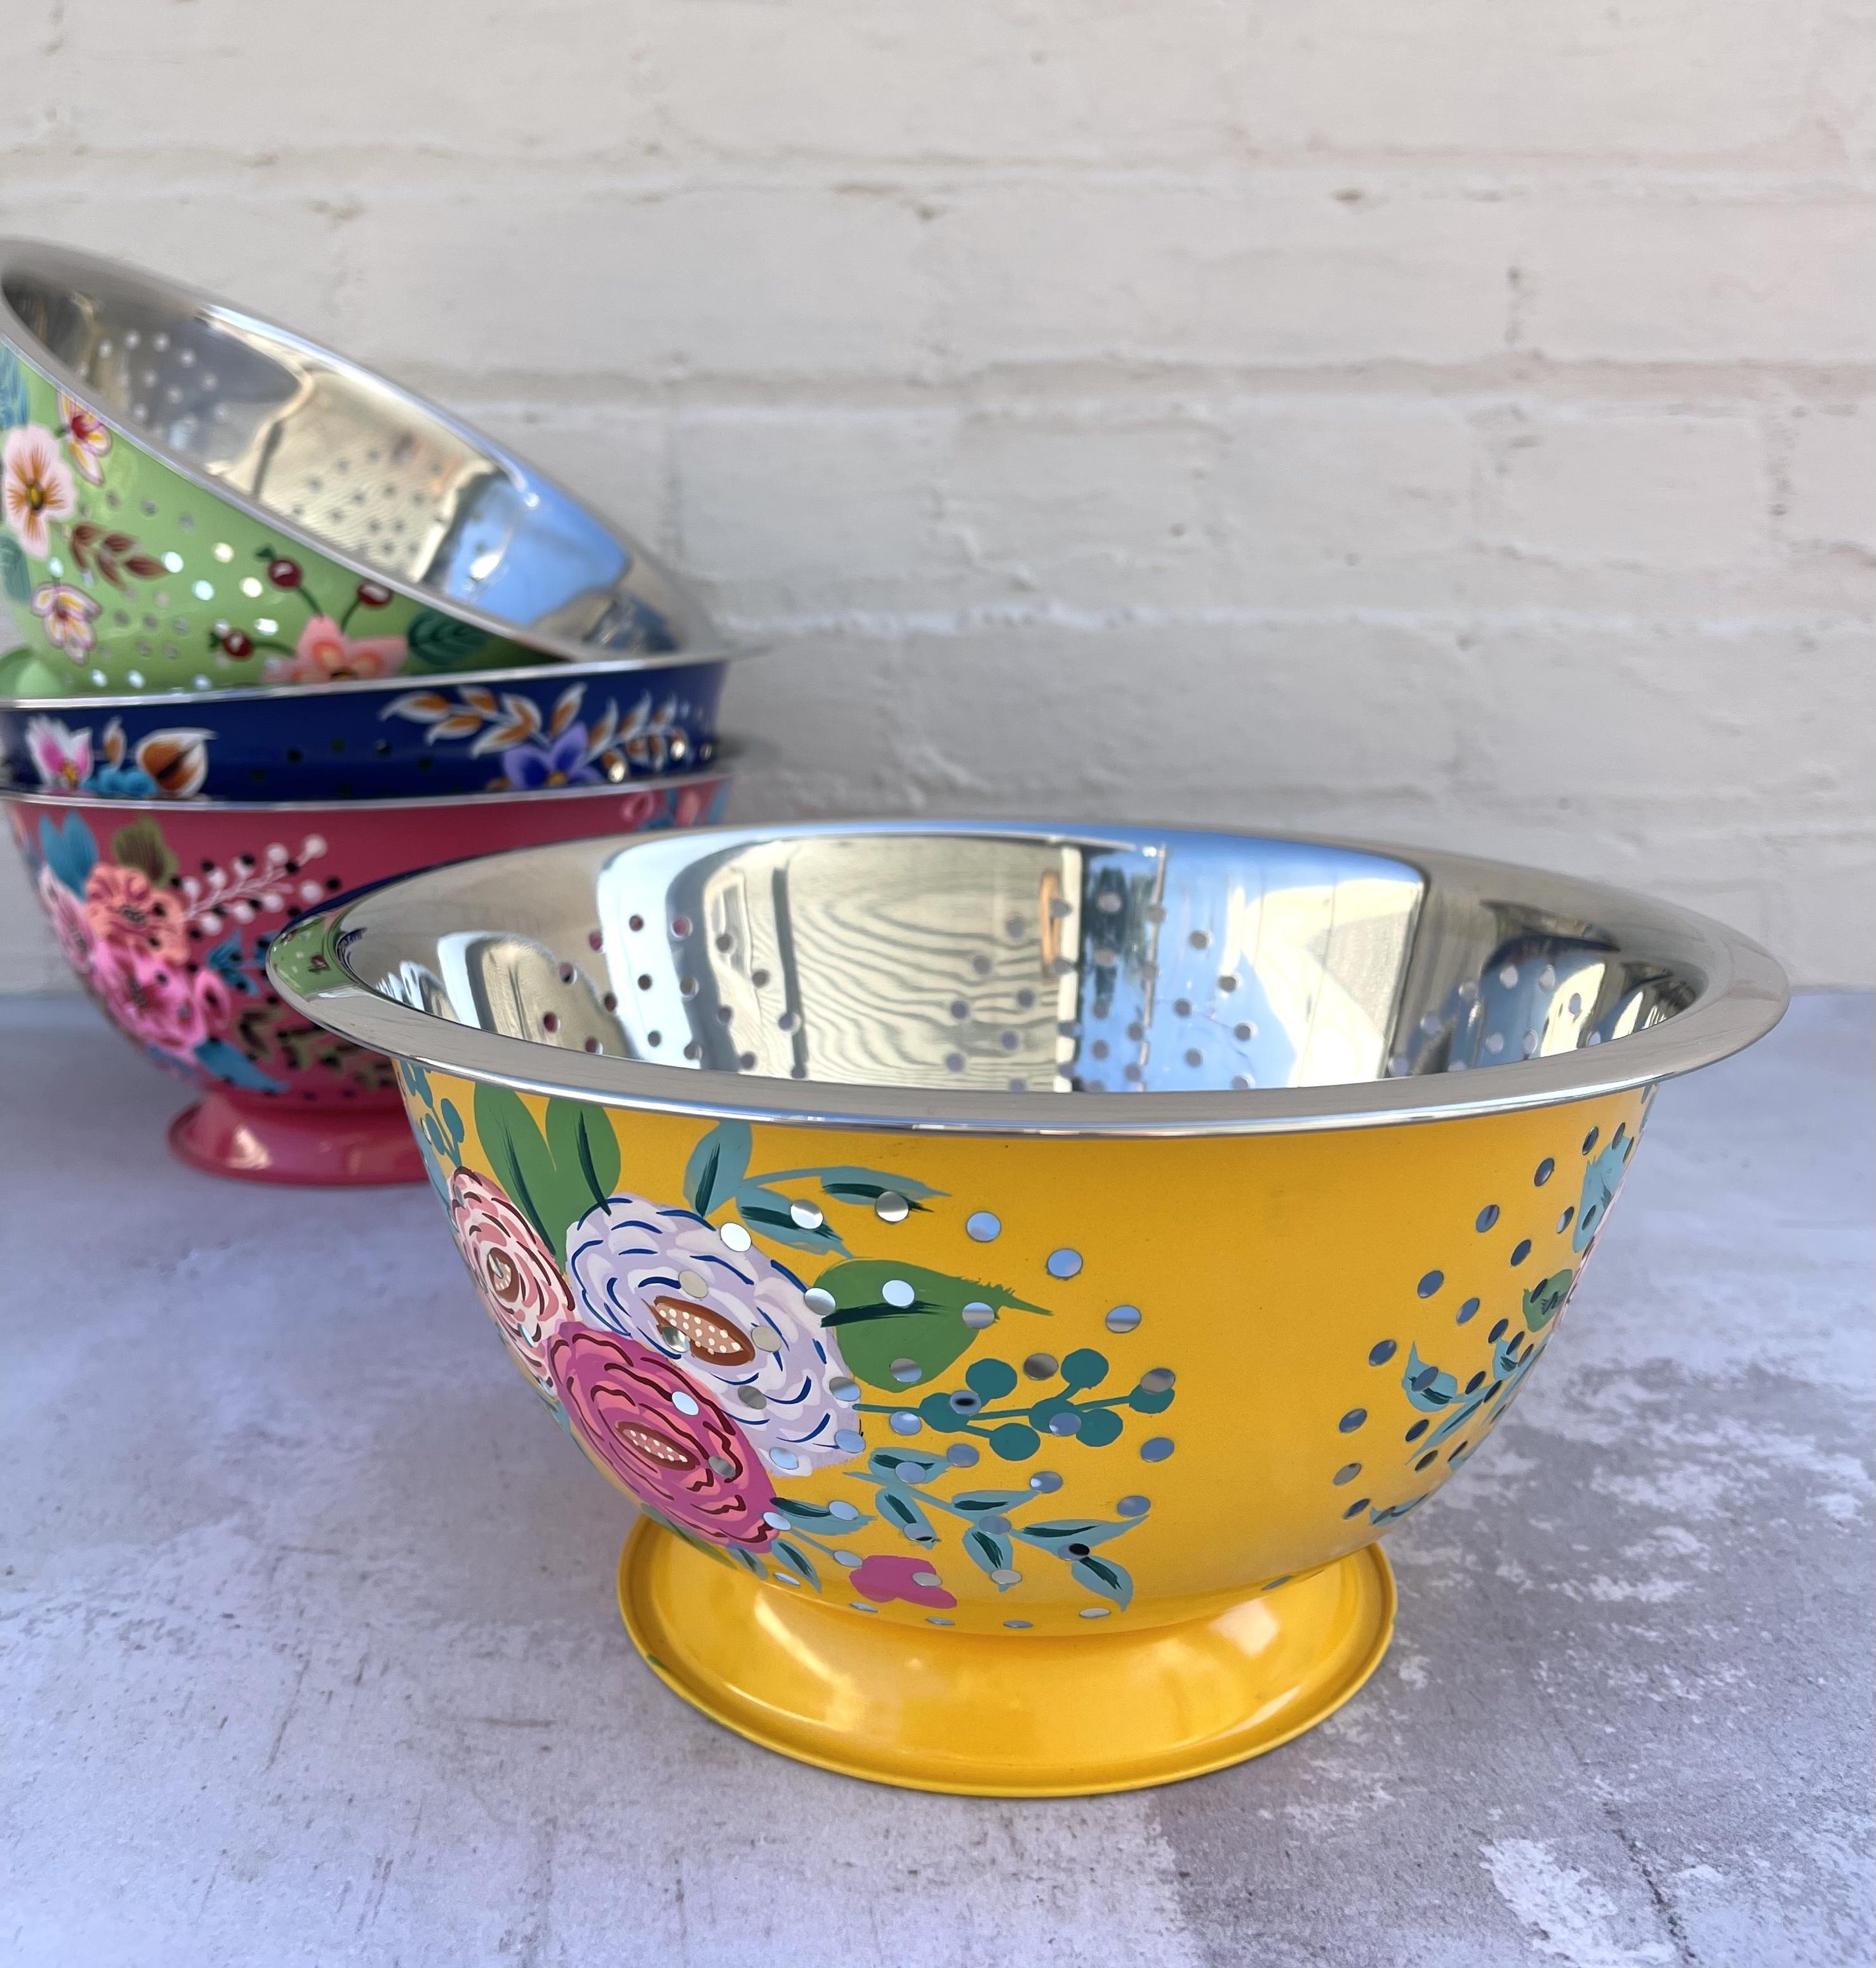 Handpainted Floral Colander, Stainless Steel: CHOOSE COLOR